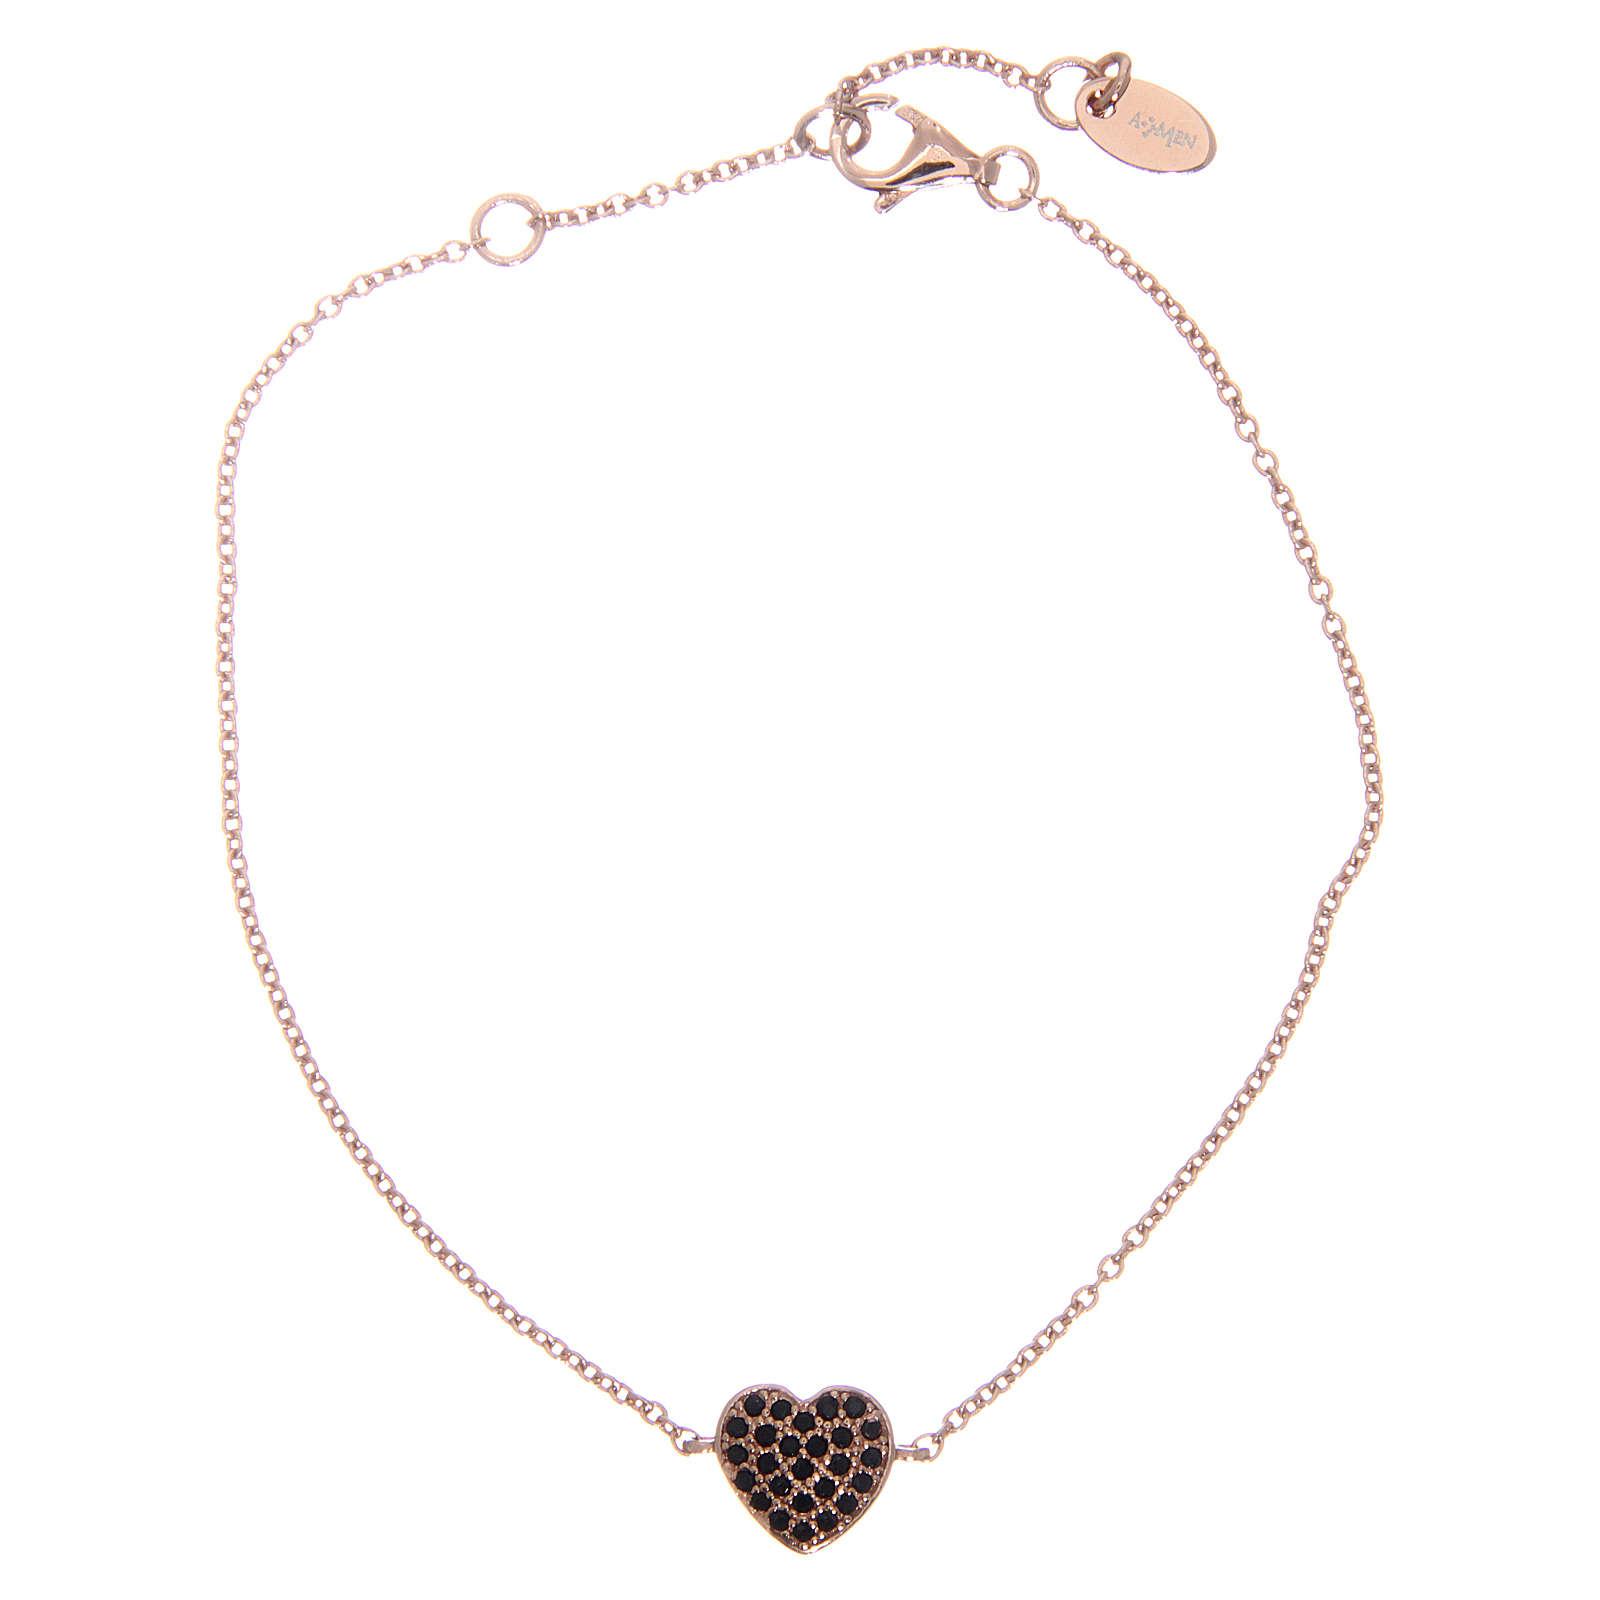 Bracciale AMEN argento 925 cuore rosé zirconi neri 4